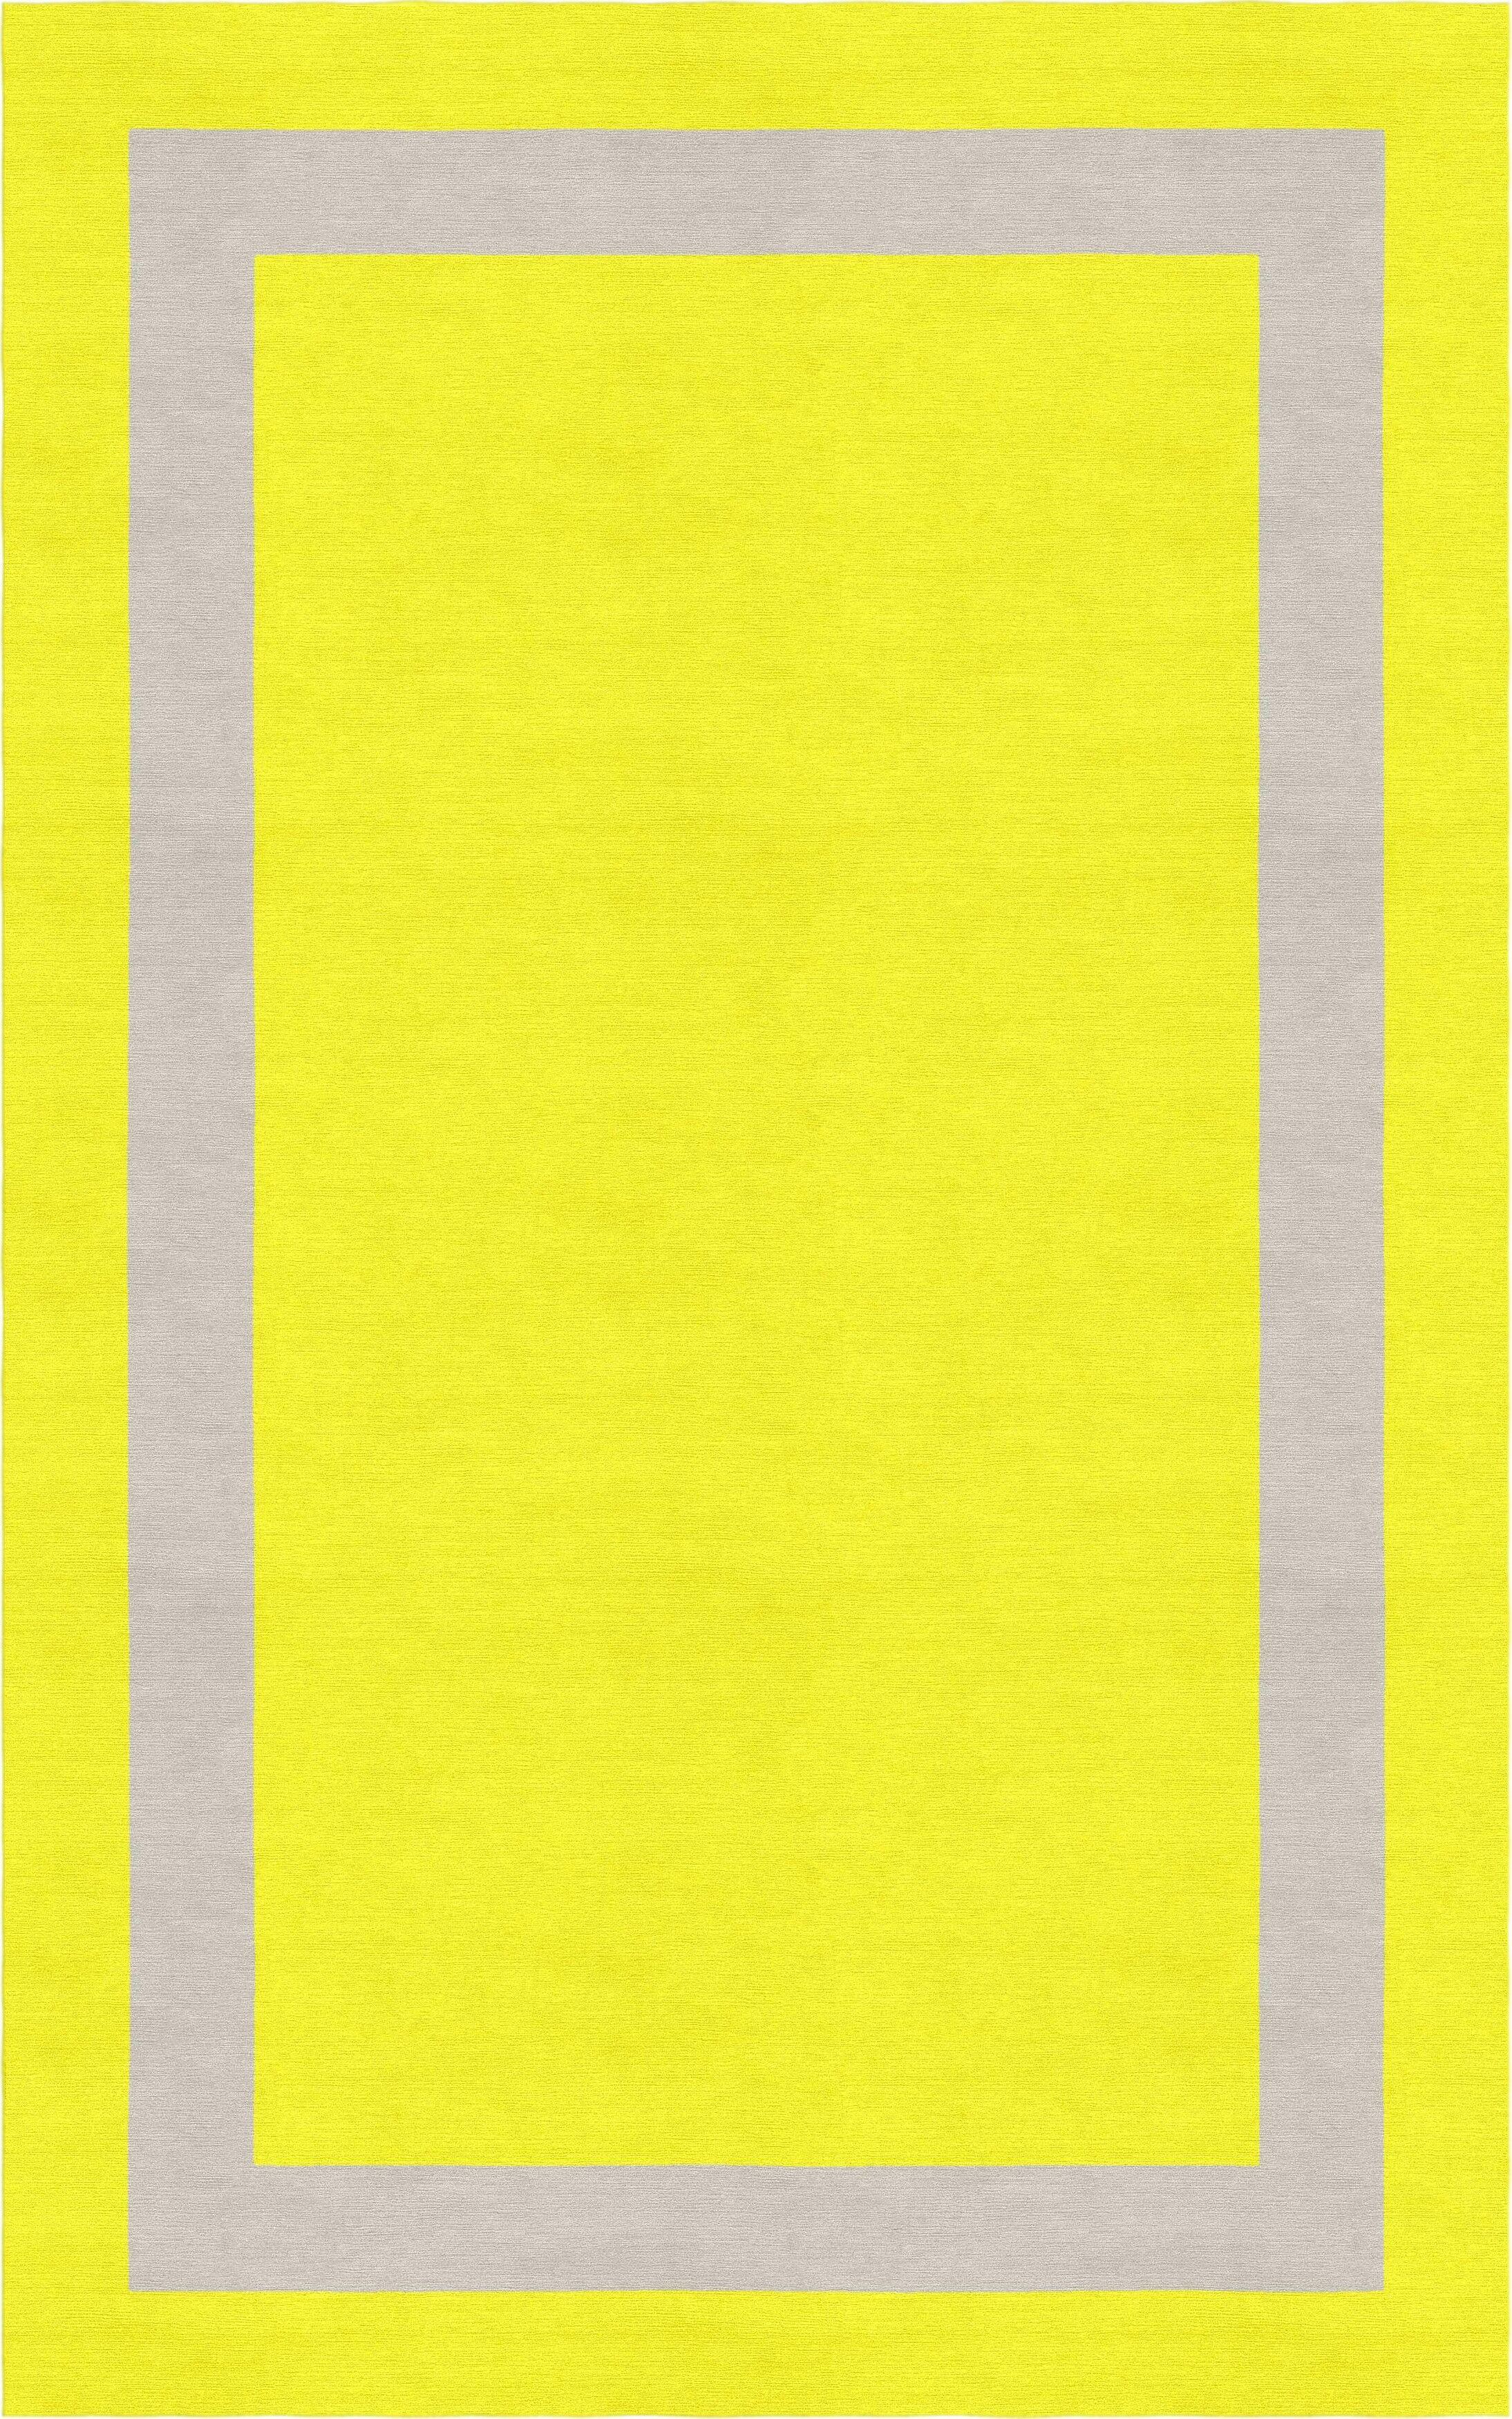 Labanara Border Hand-Tufted Wool Yellow/Silver Area Rug Rug Size: Rectangle 9' x 12'